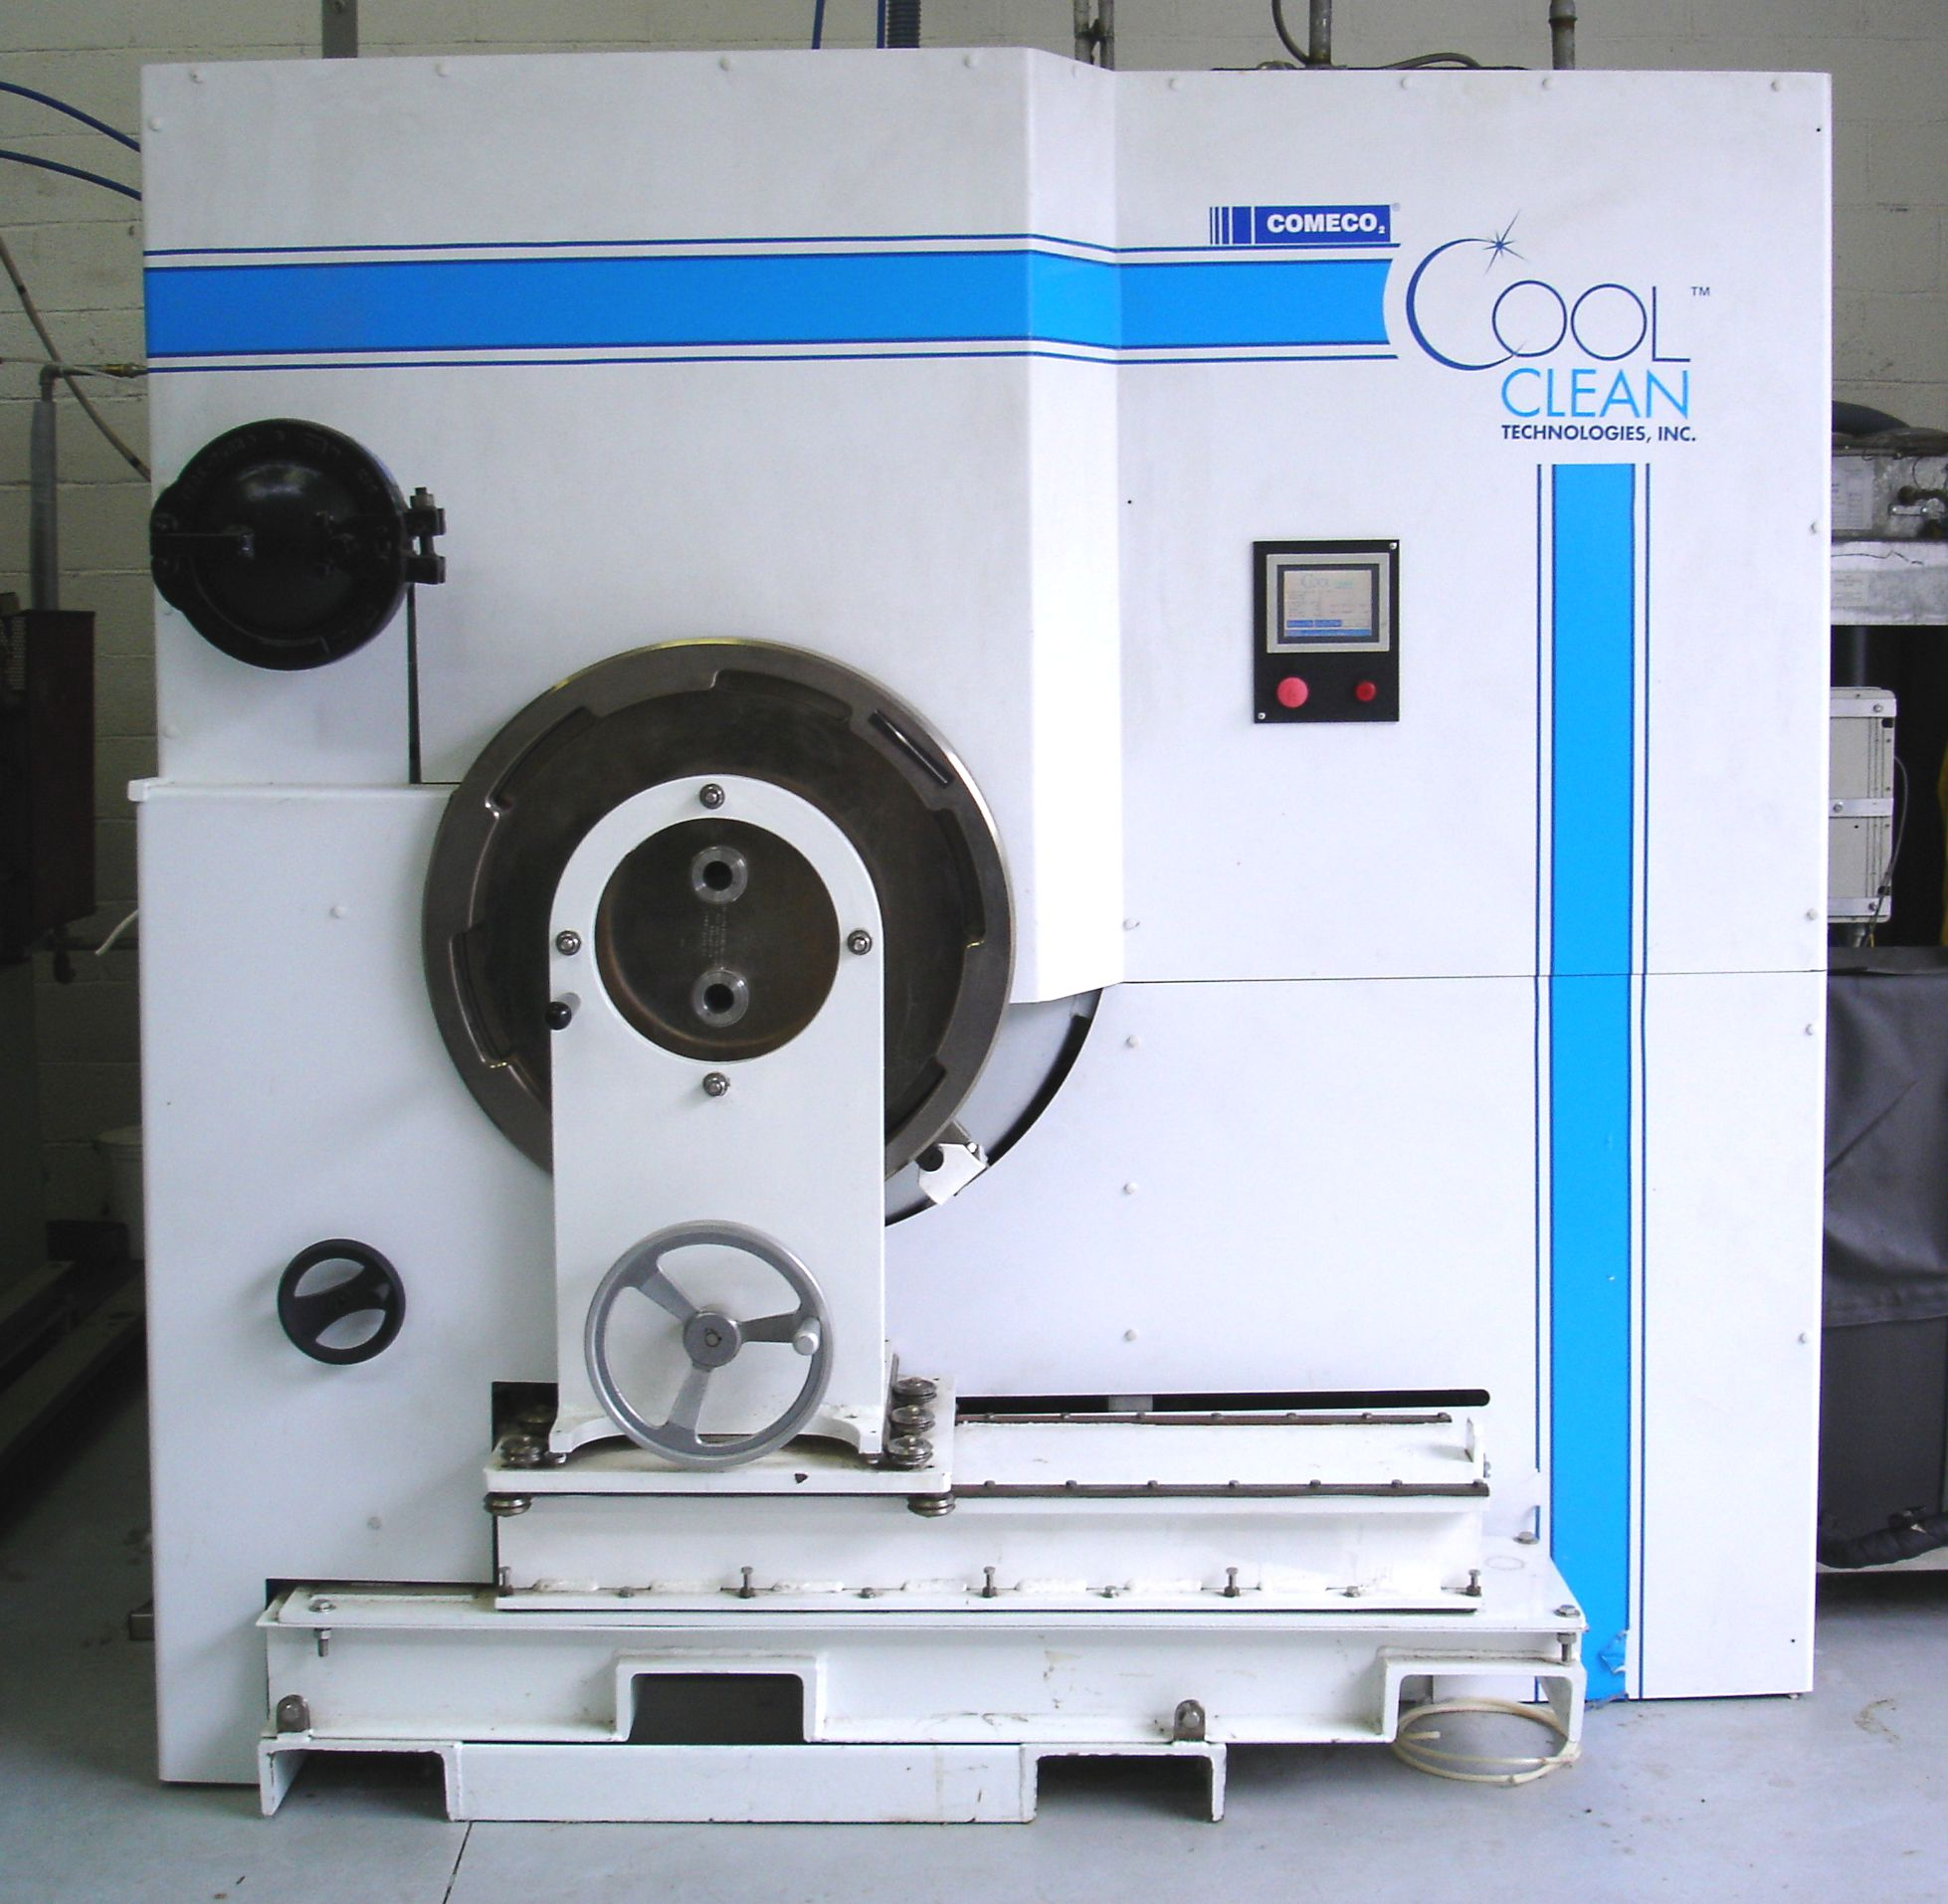 Dry Cleaning Machine Using Liquid CO2